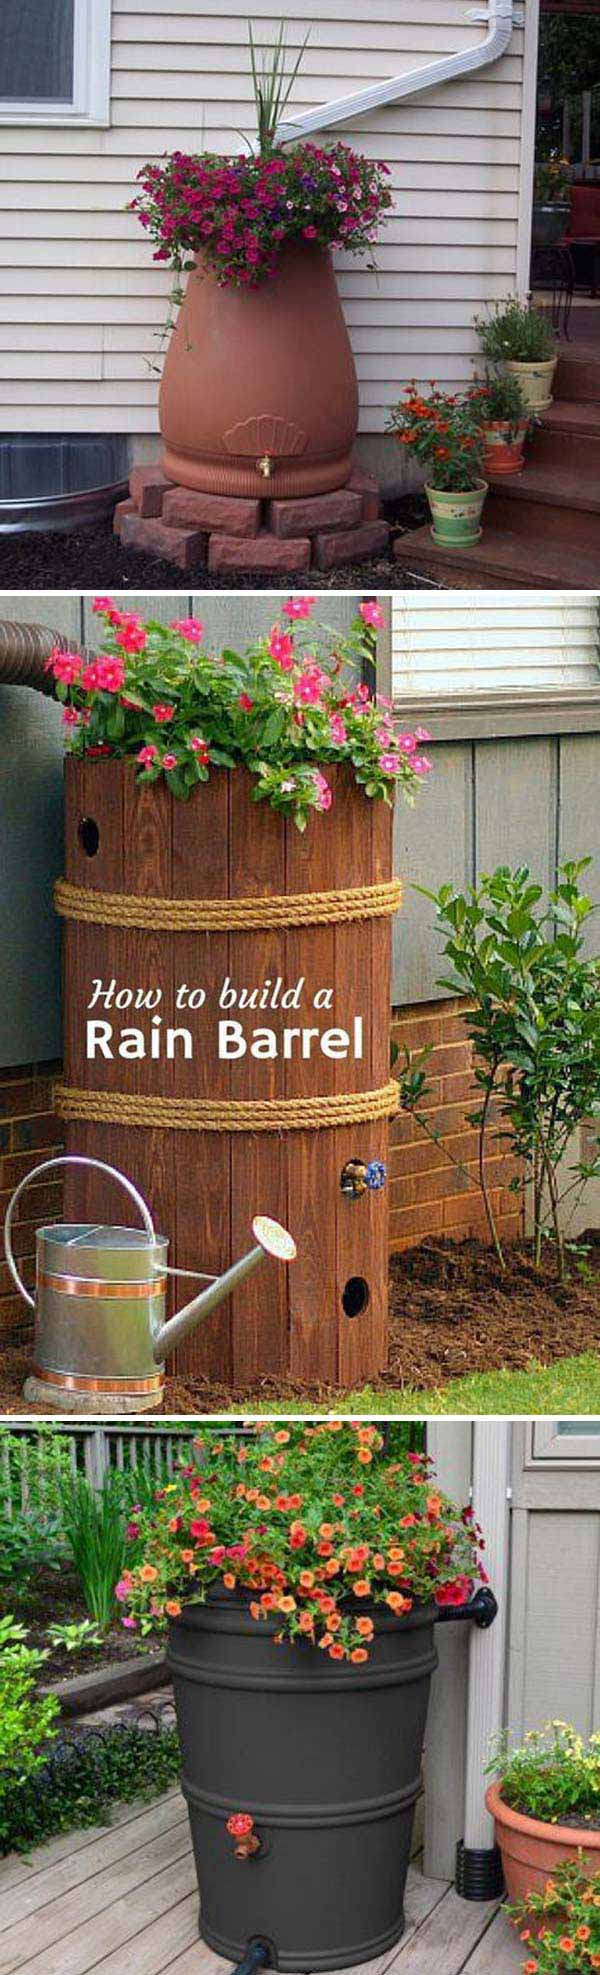 The Best 20 DIY Ideas to Create a Decorative Downspout Landscape ...